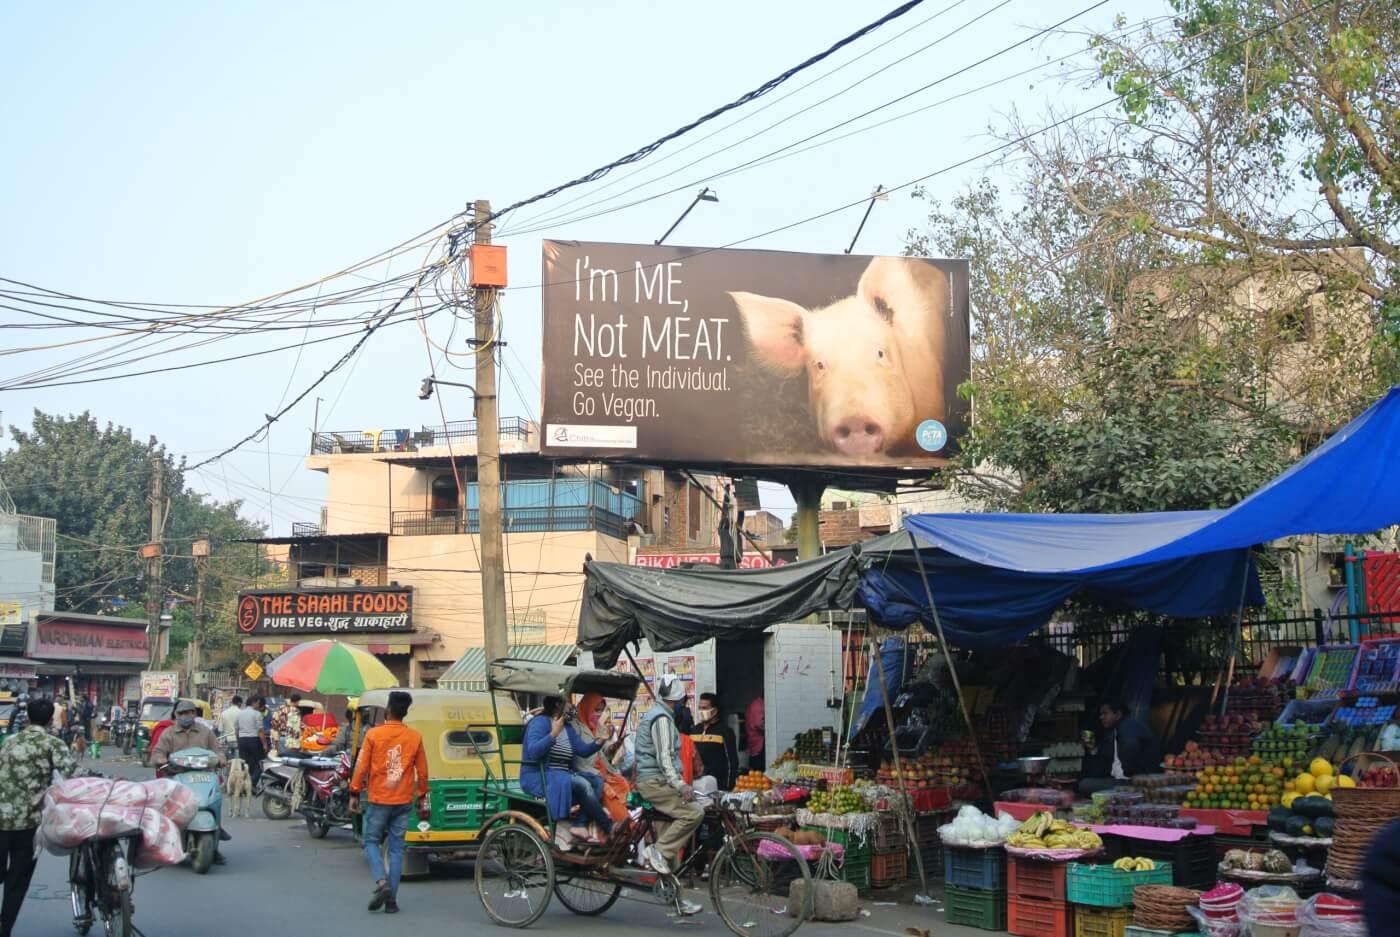 Shahdara market pig i'm me not meat